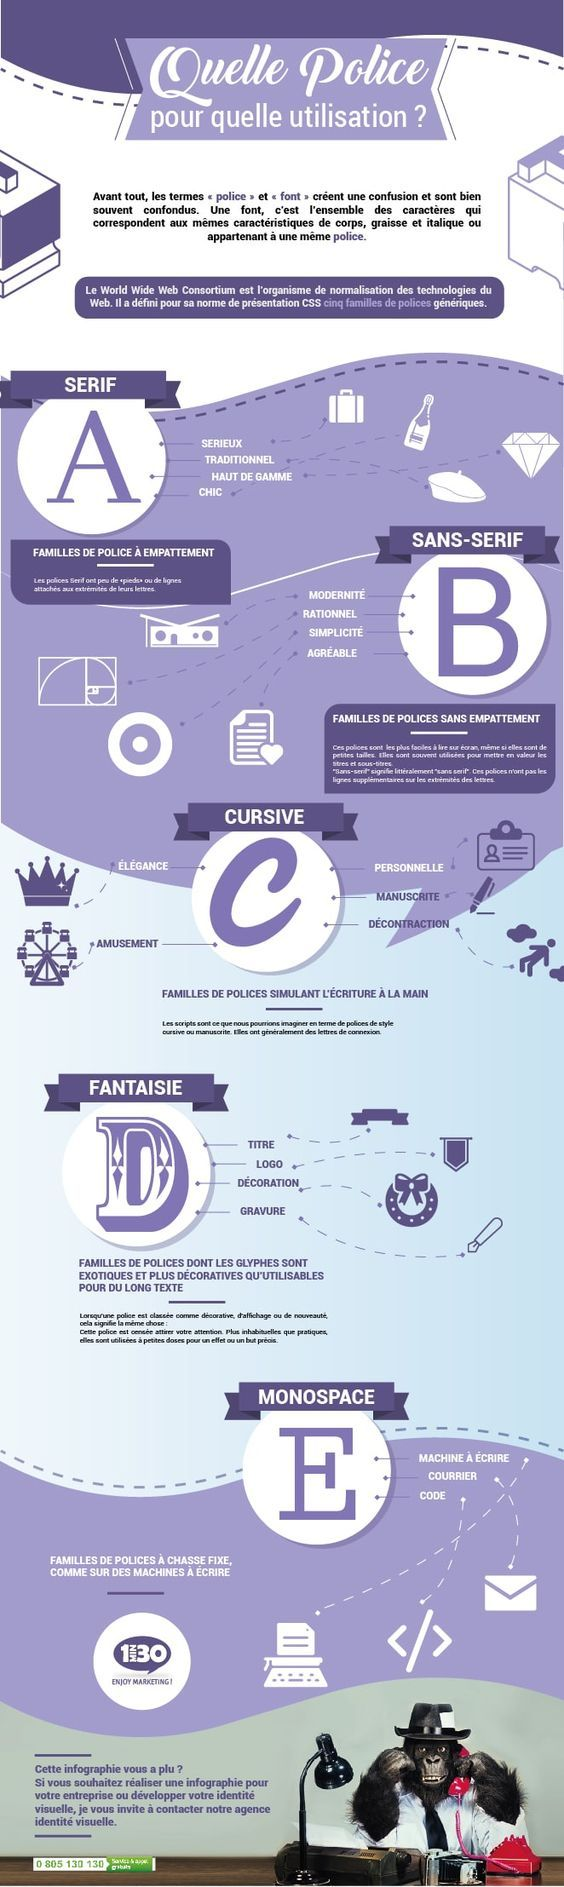 Agence Identite Visuelle Creation Graphique Typographie Graphique